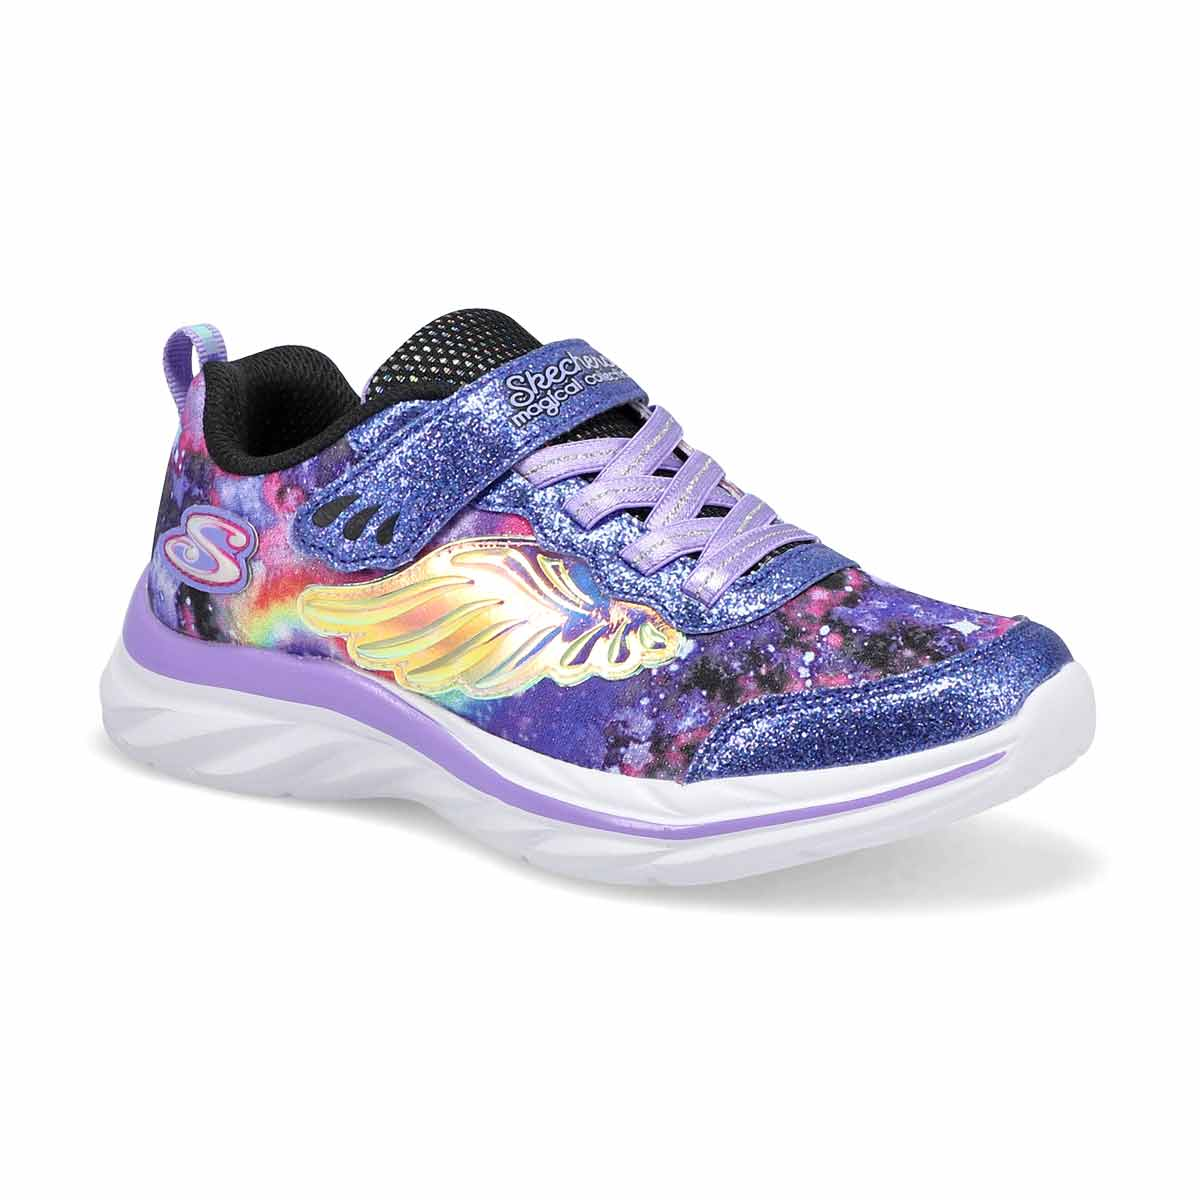 Girls' Quick Kicks Flying Beauty Sneaker